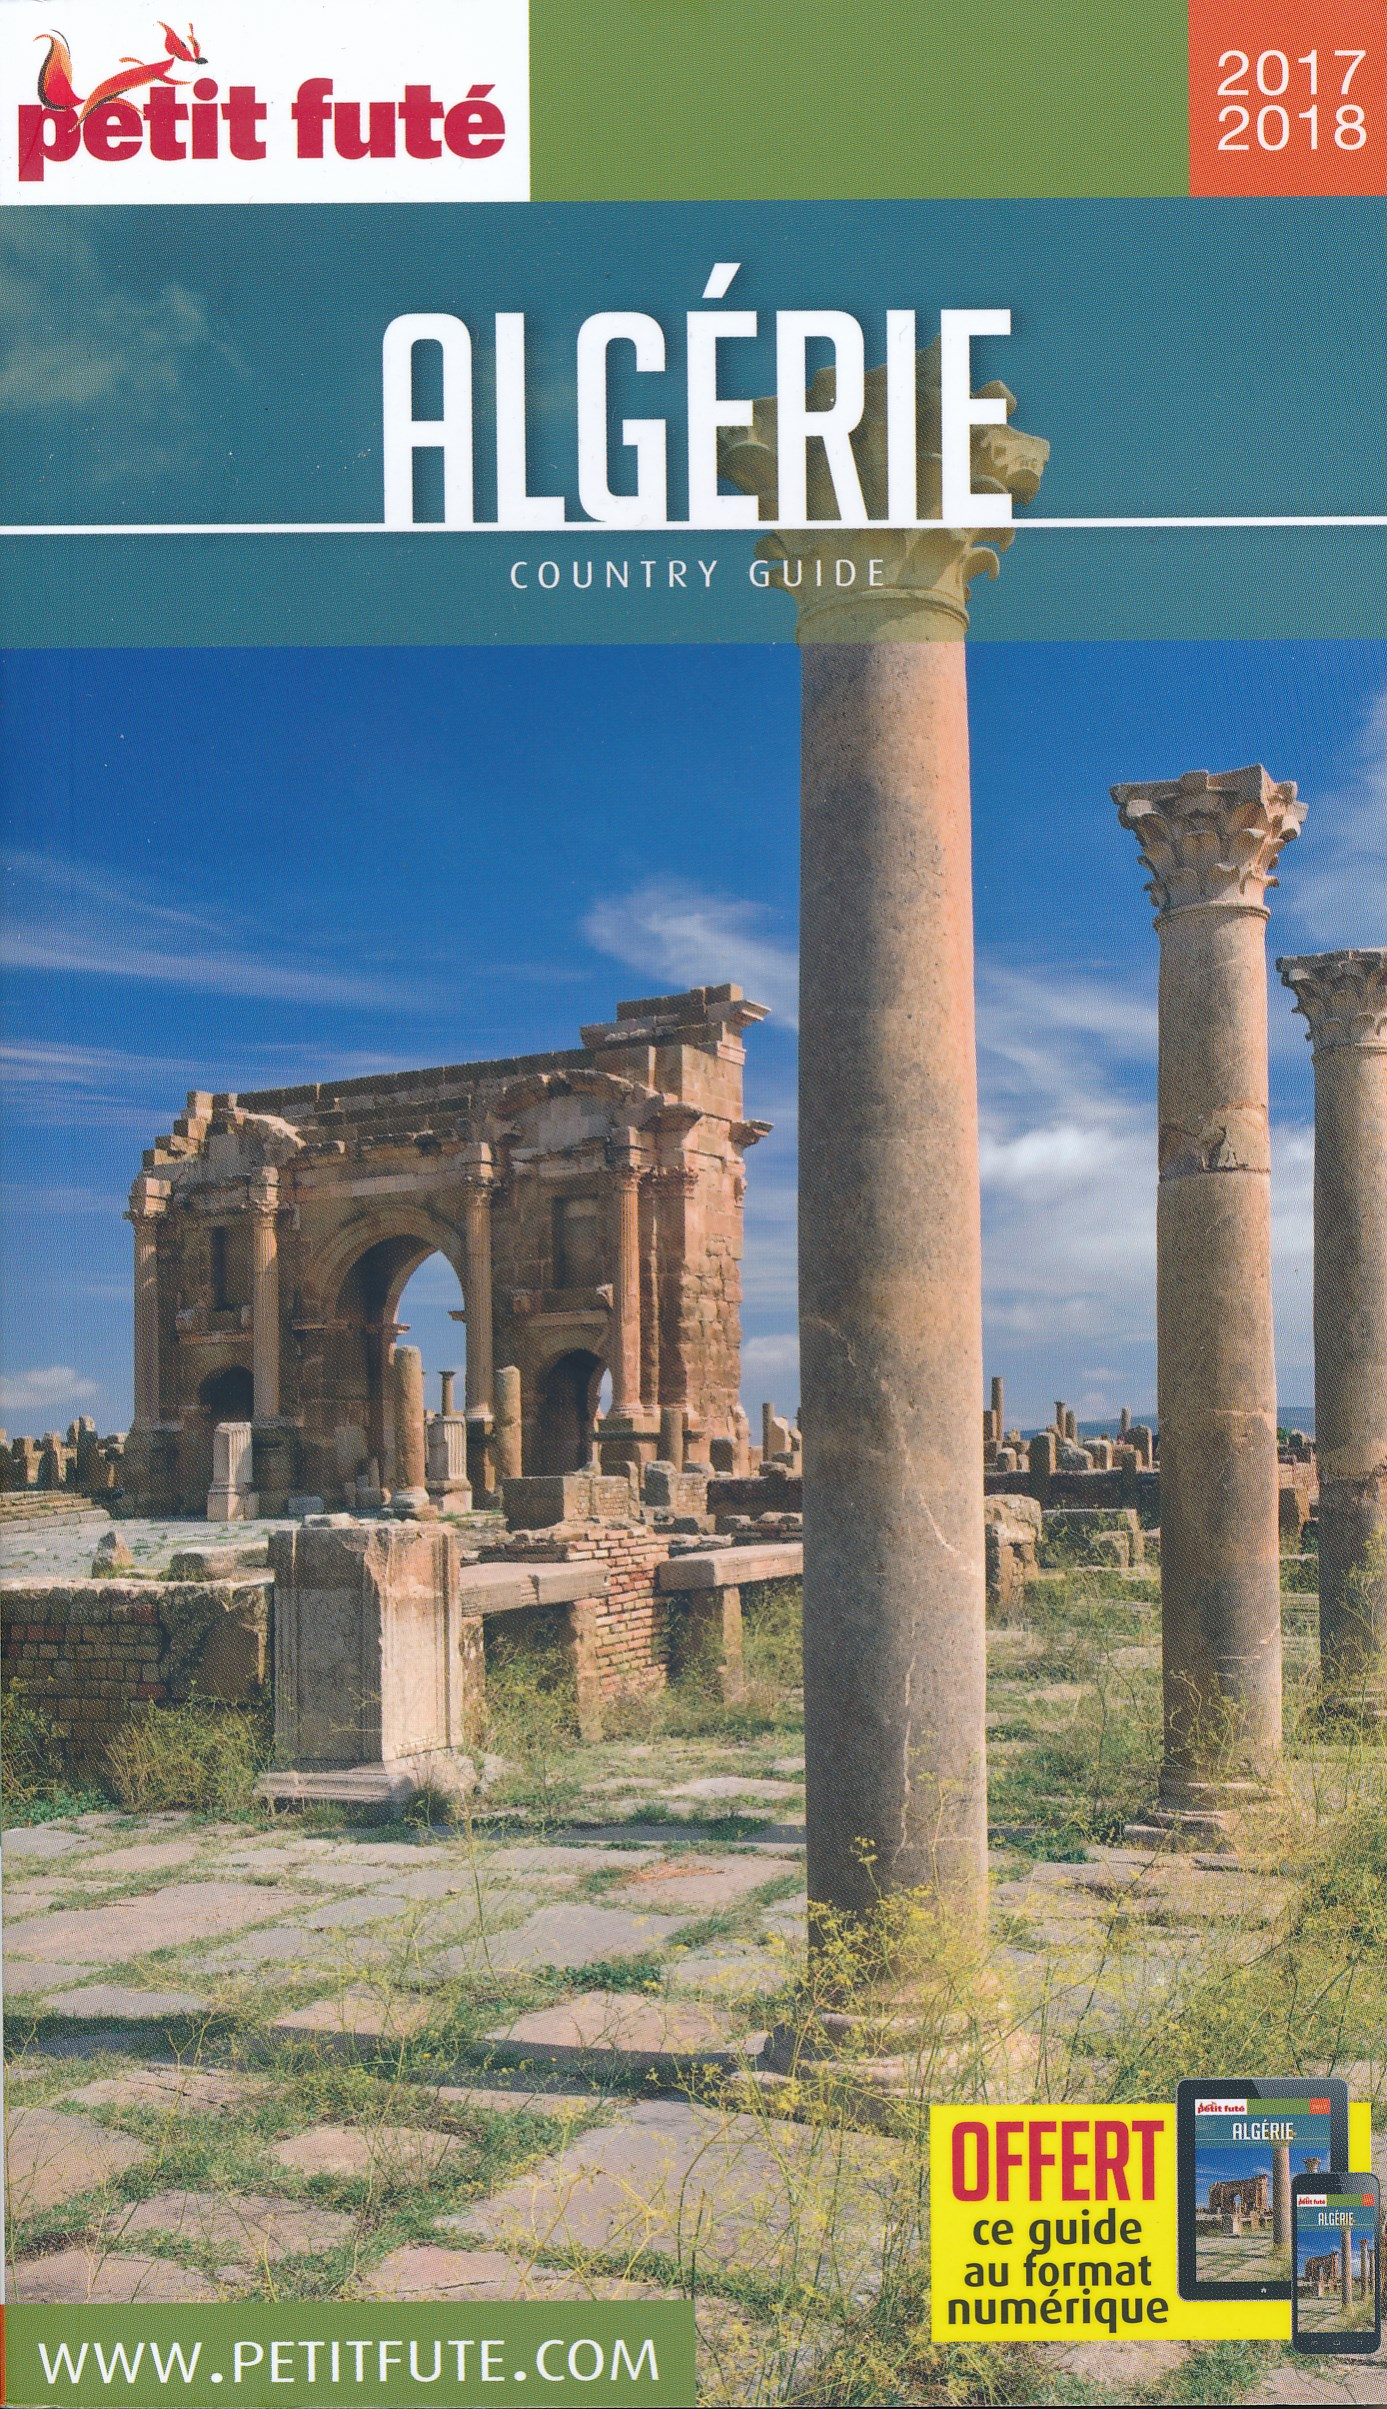 Online bestellen: Reisgids Algerije - Algérie | Petit Futé